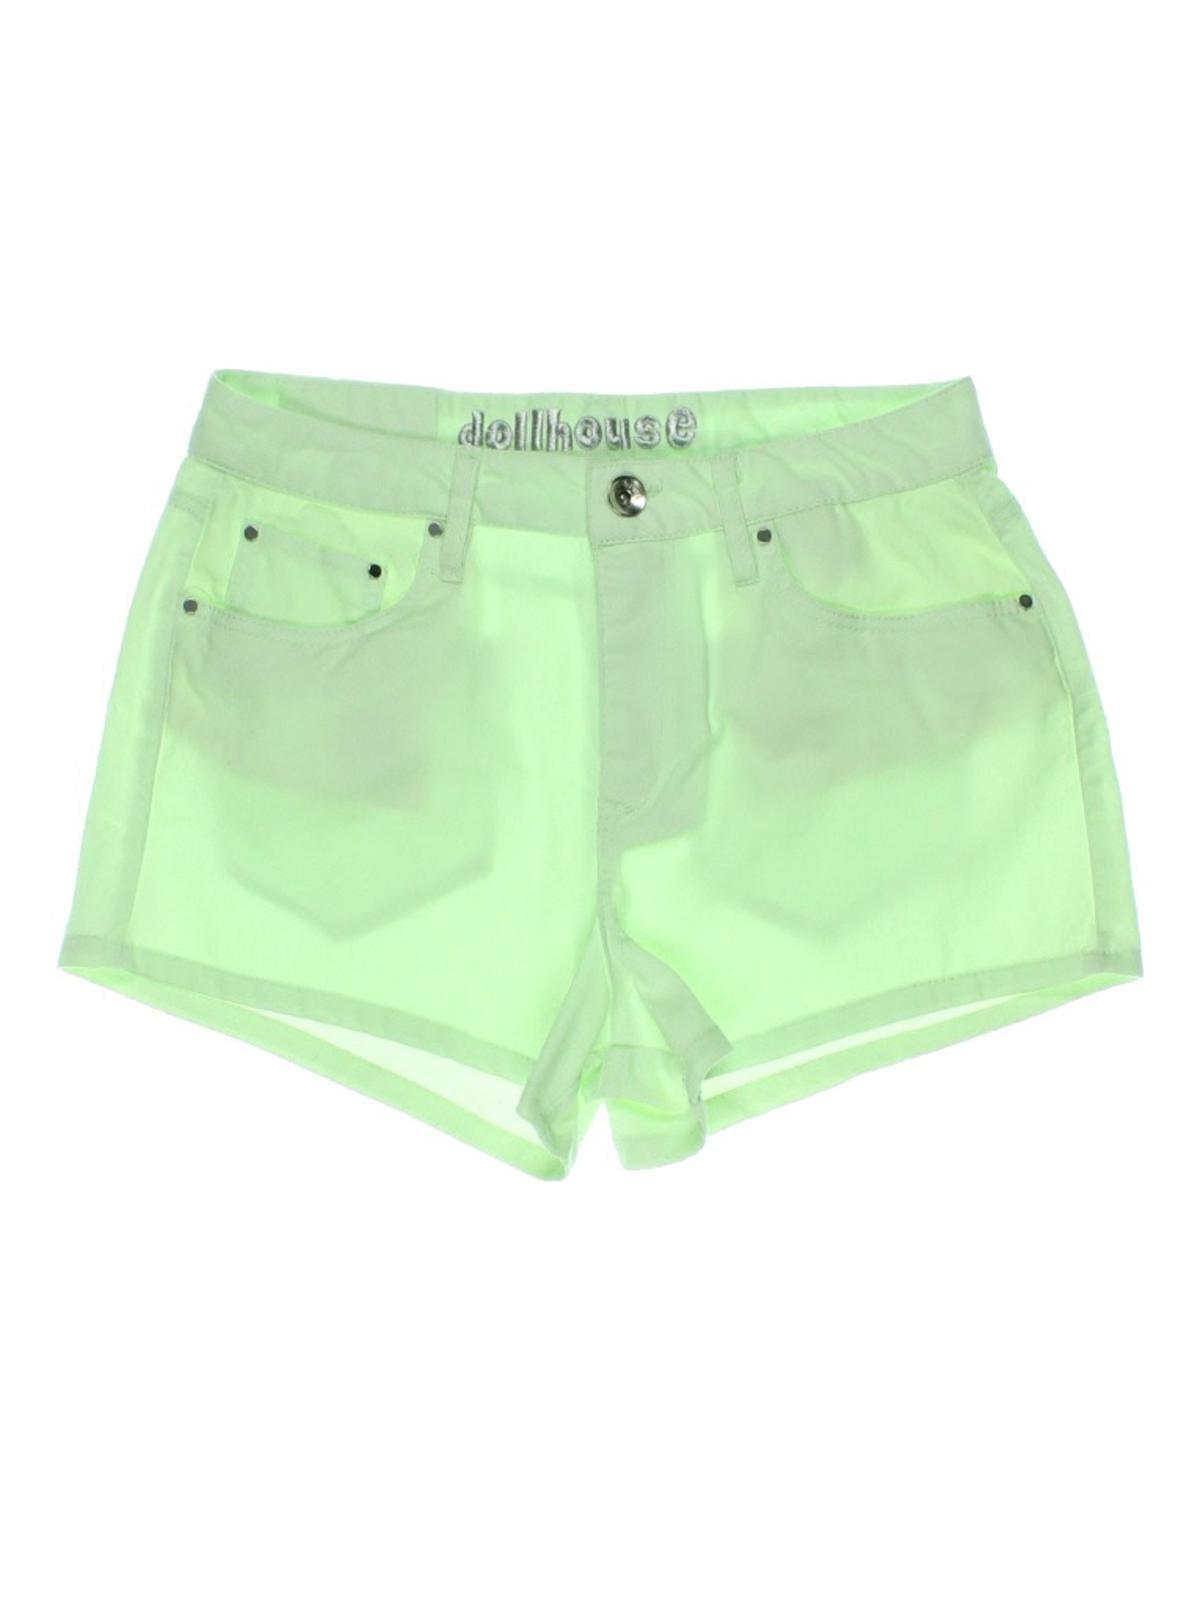 dollhouse Womens Summer Night Denim Denim Shorts